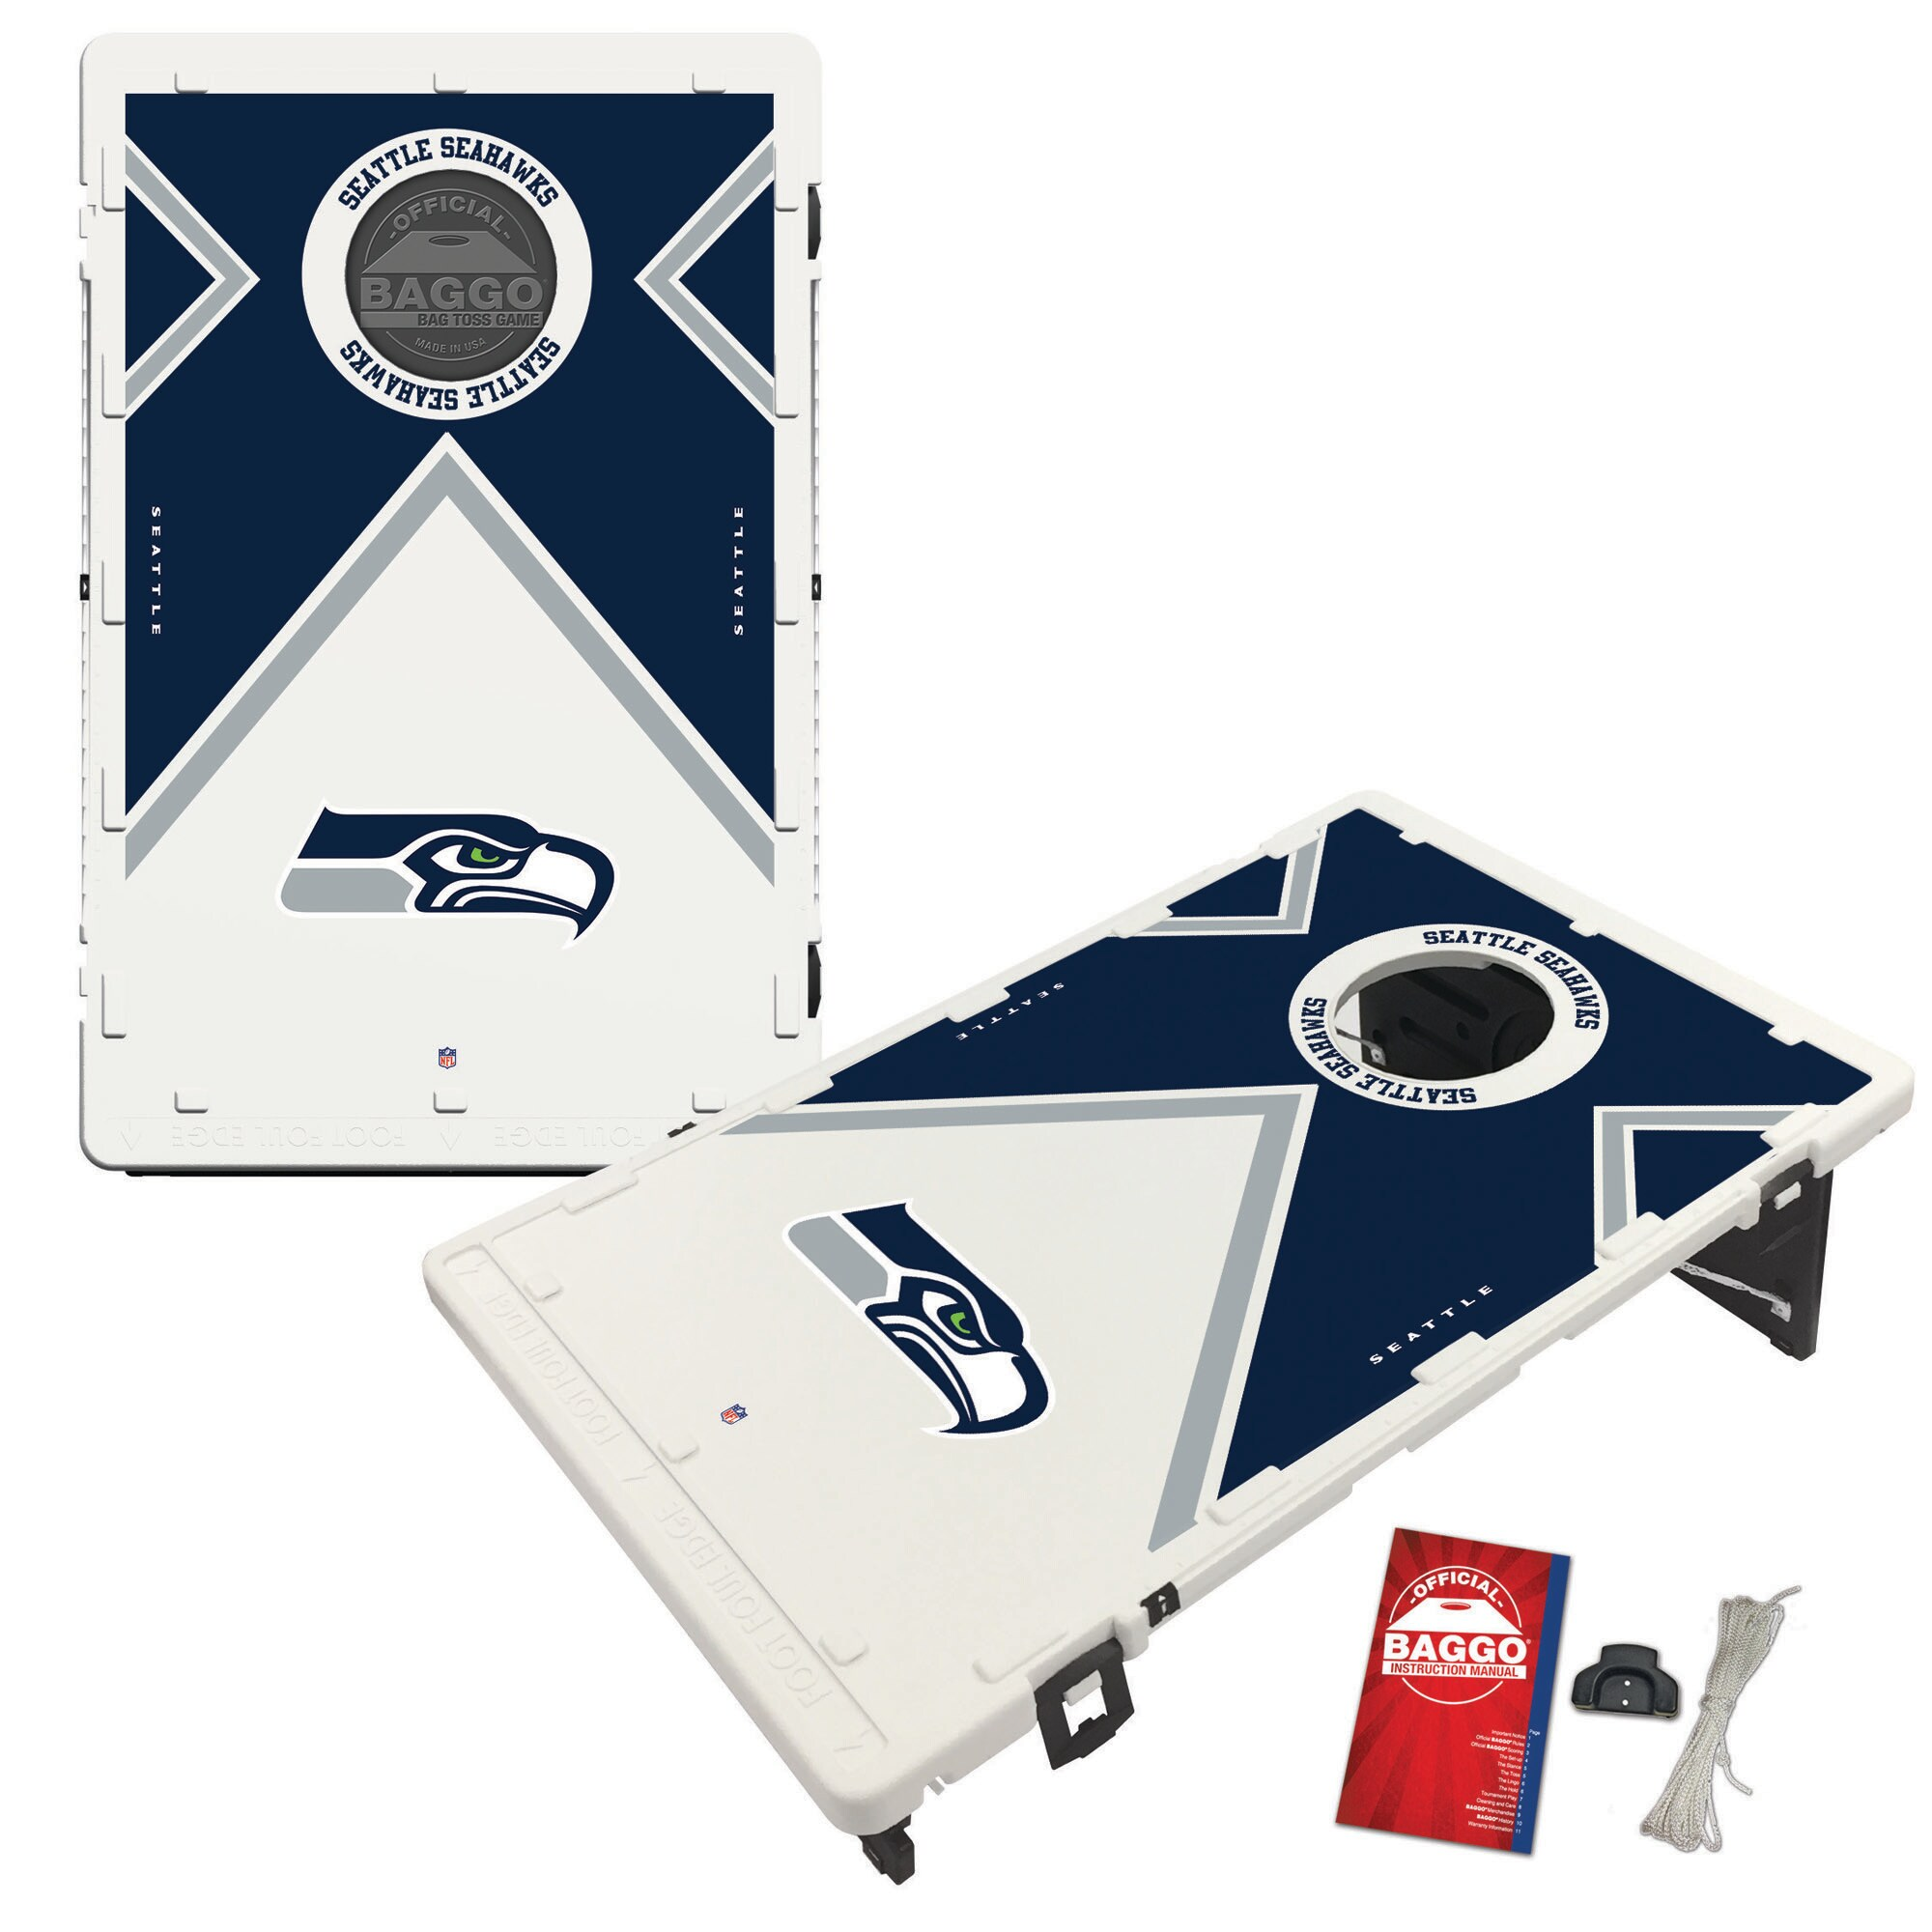 Seattle Seahawks 2' x 3' BAGGO Vintage Cornhole Board Tailgate Toss Set